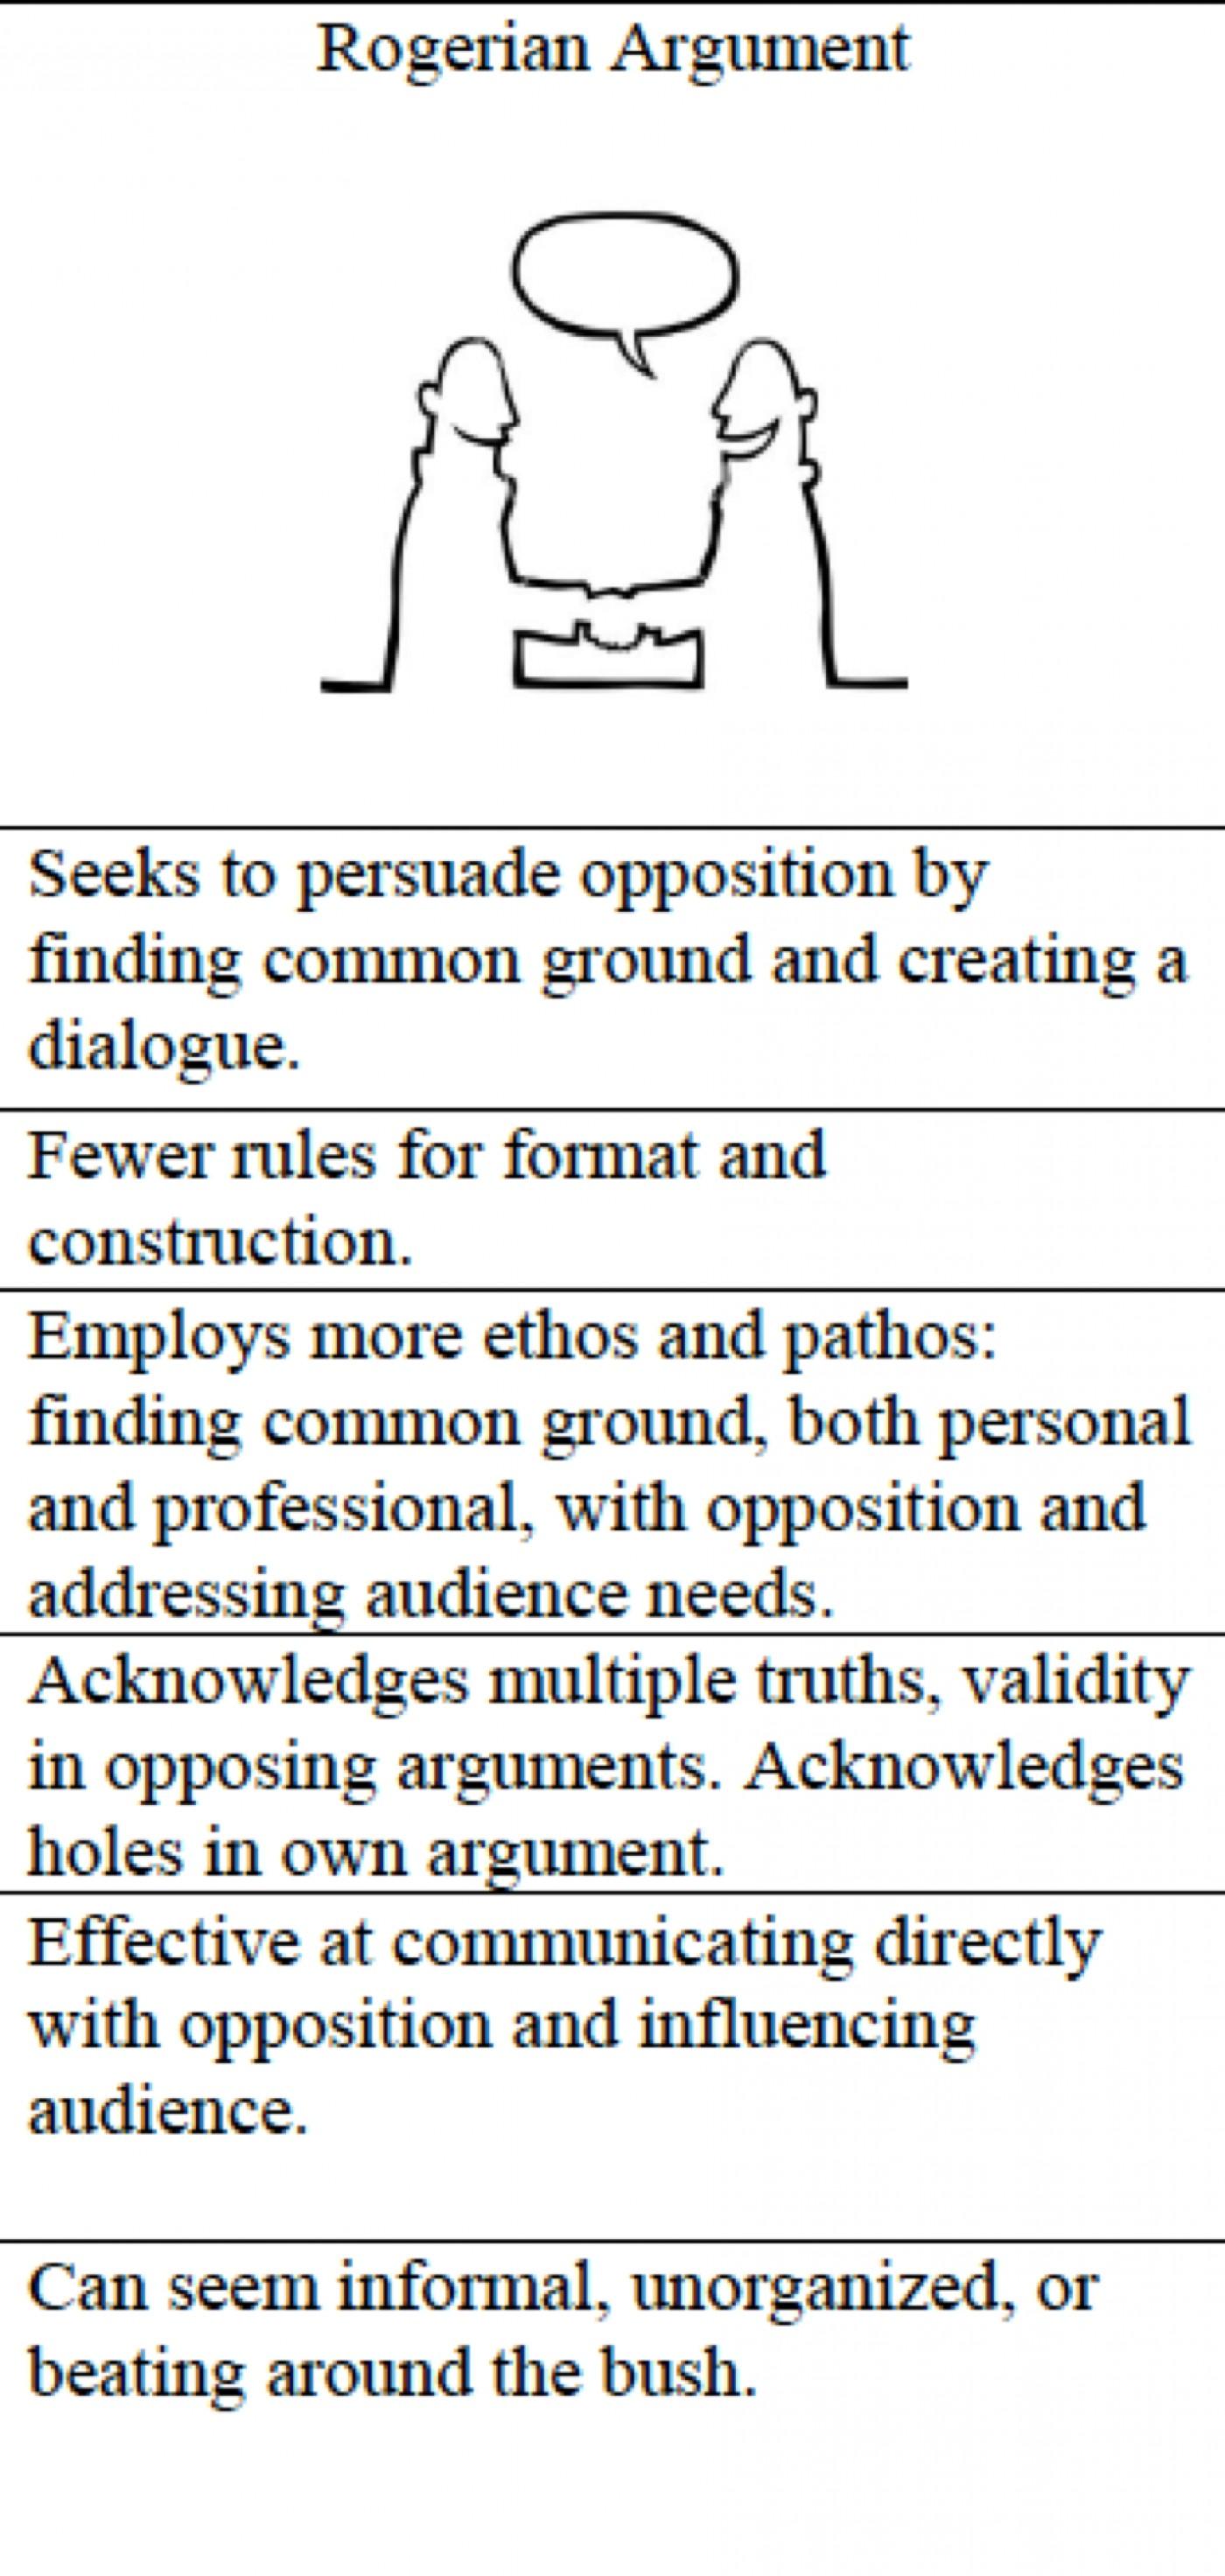 015 Essay Example Best Rogerian Argument Sentence Abortion Style Topics 1400